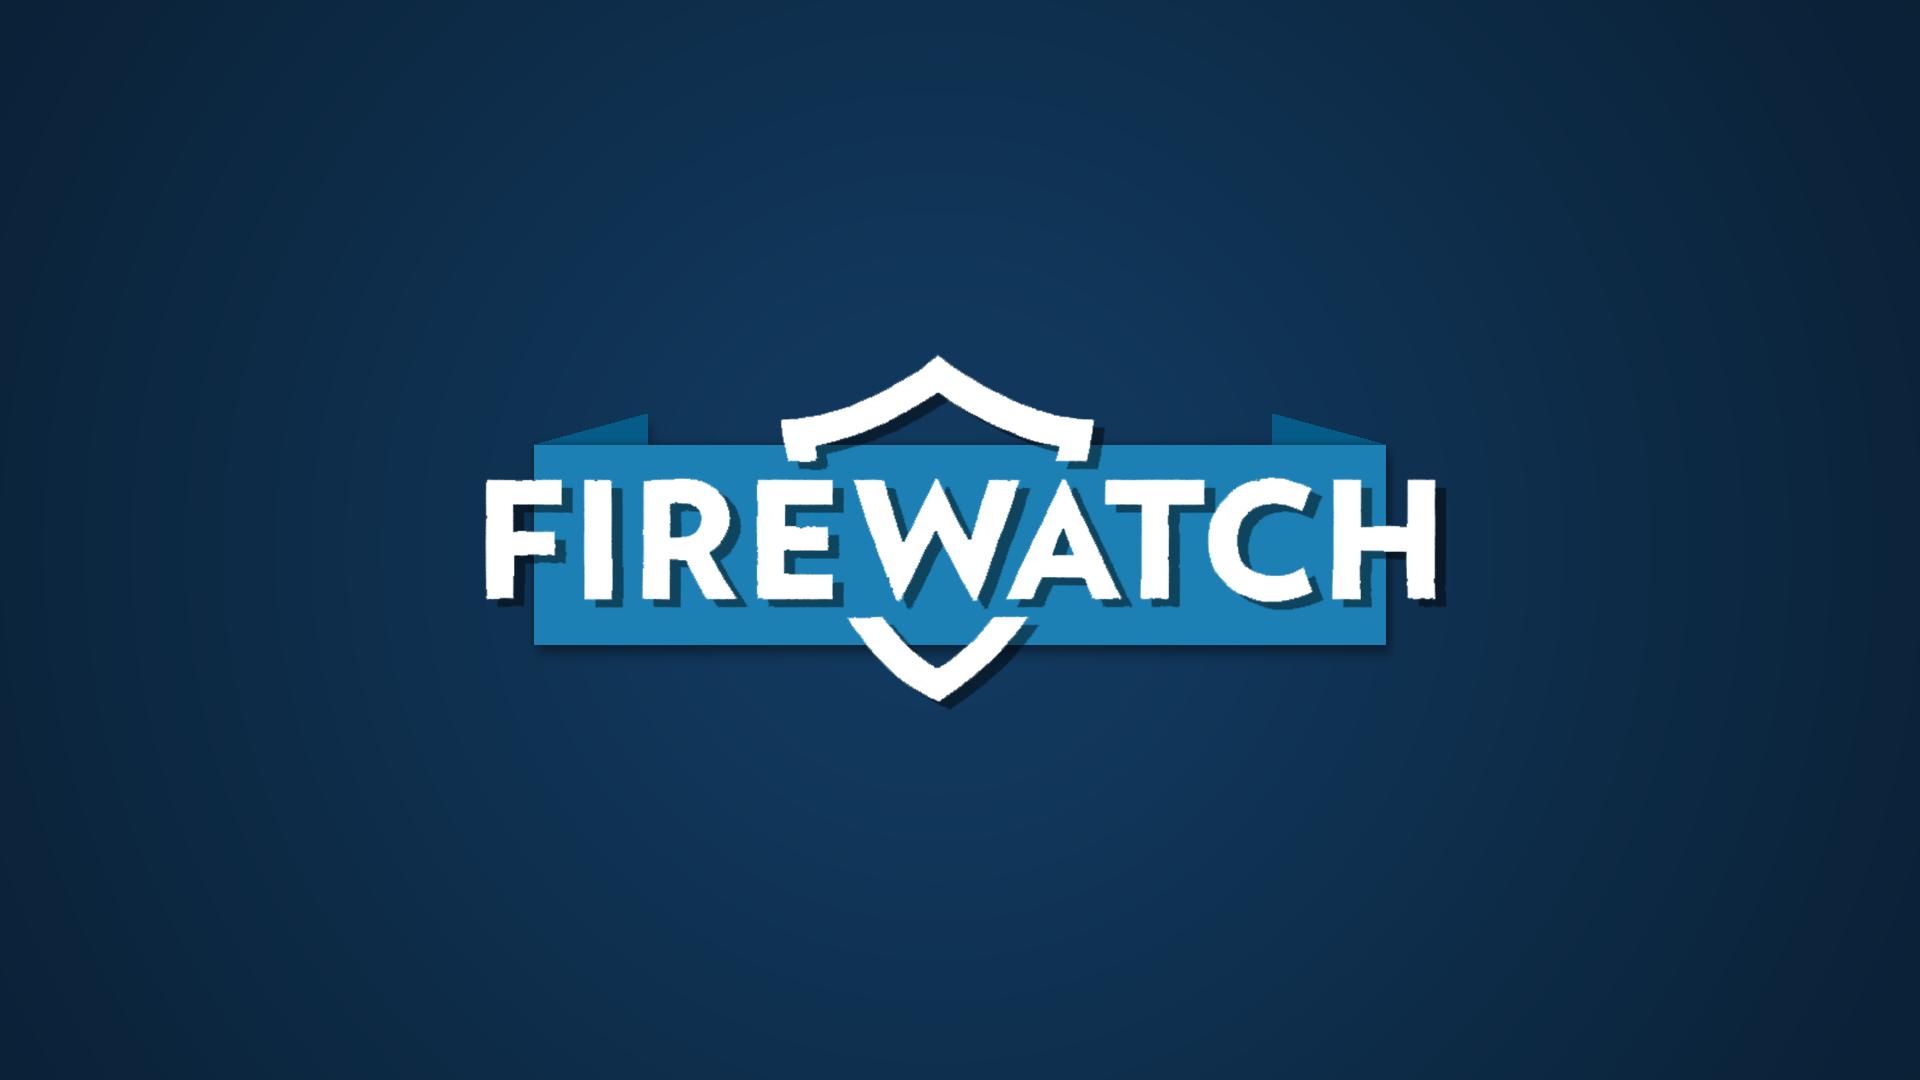 Firewatch Typography Blue Background 1920x1080